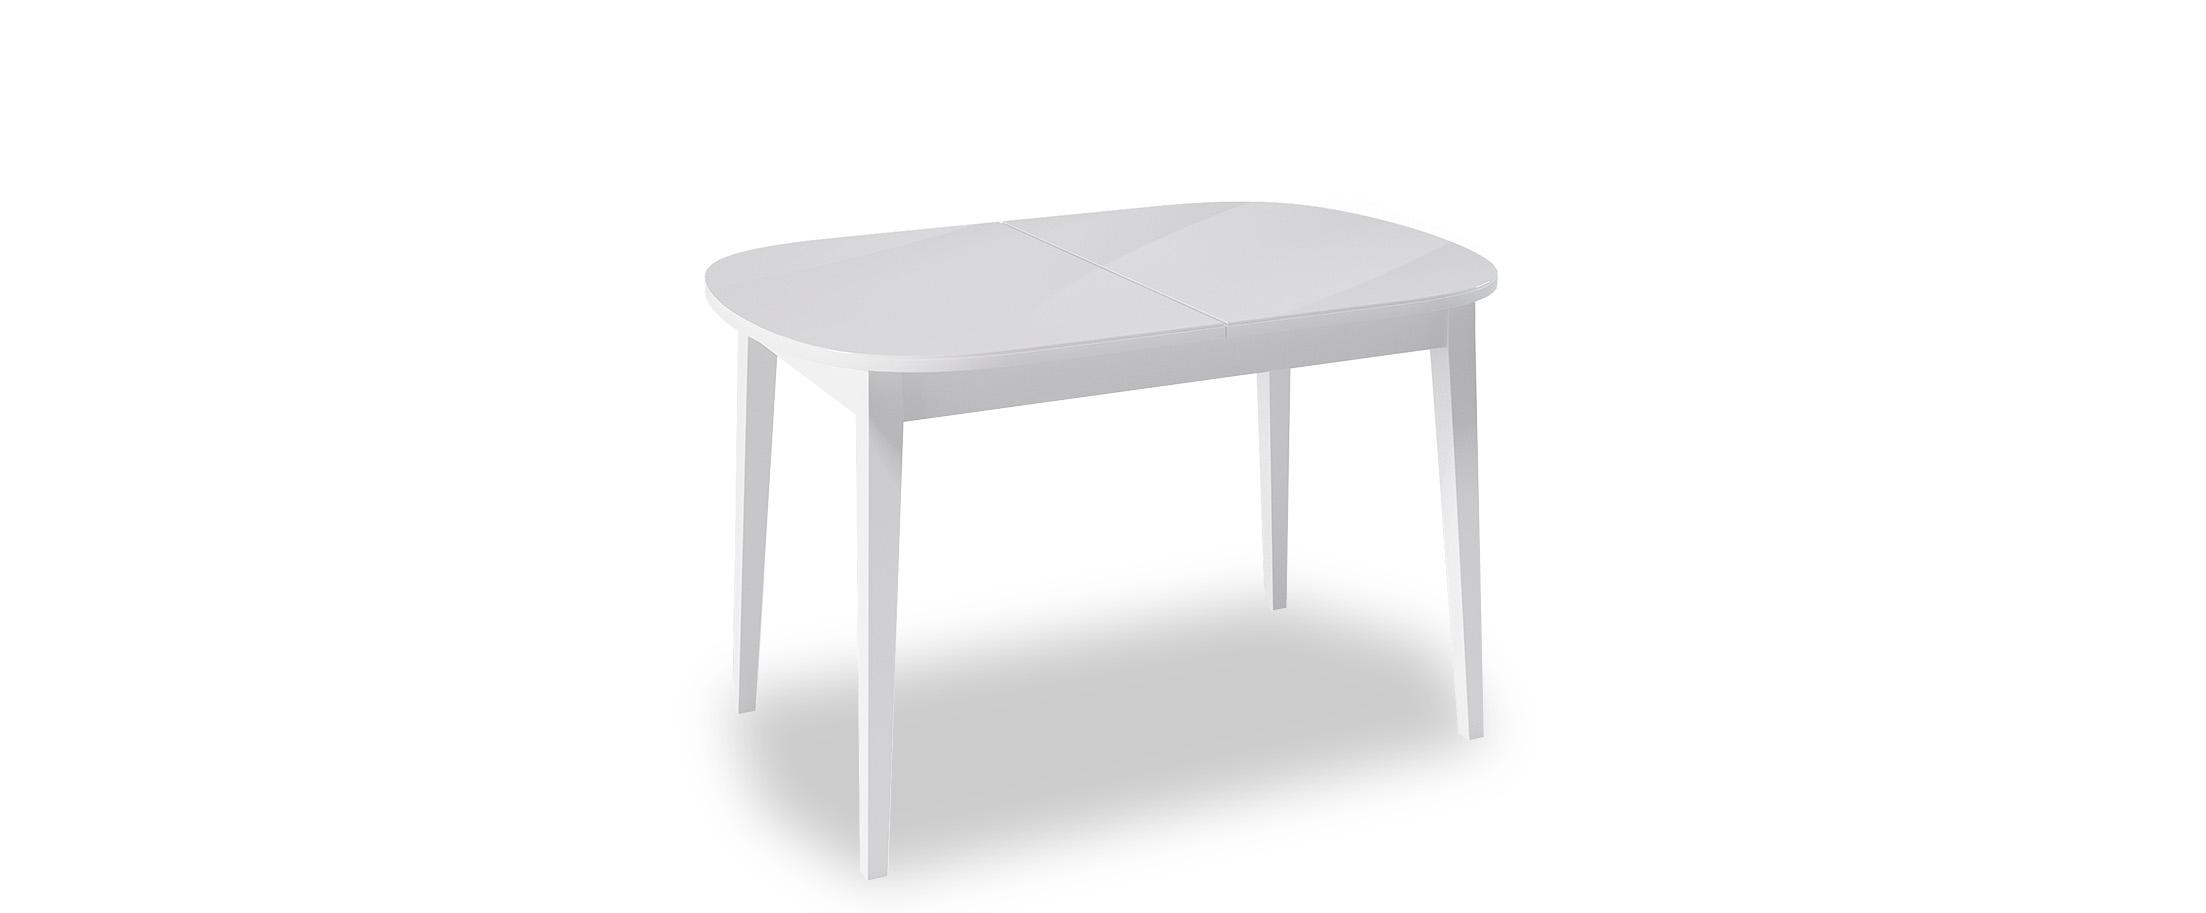 Стол обеденный Kenner 1300M Модель 370 от MOON TRADE